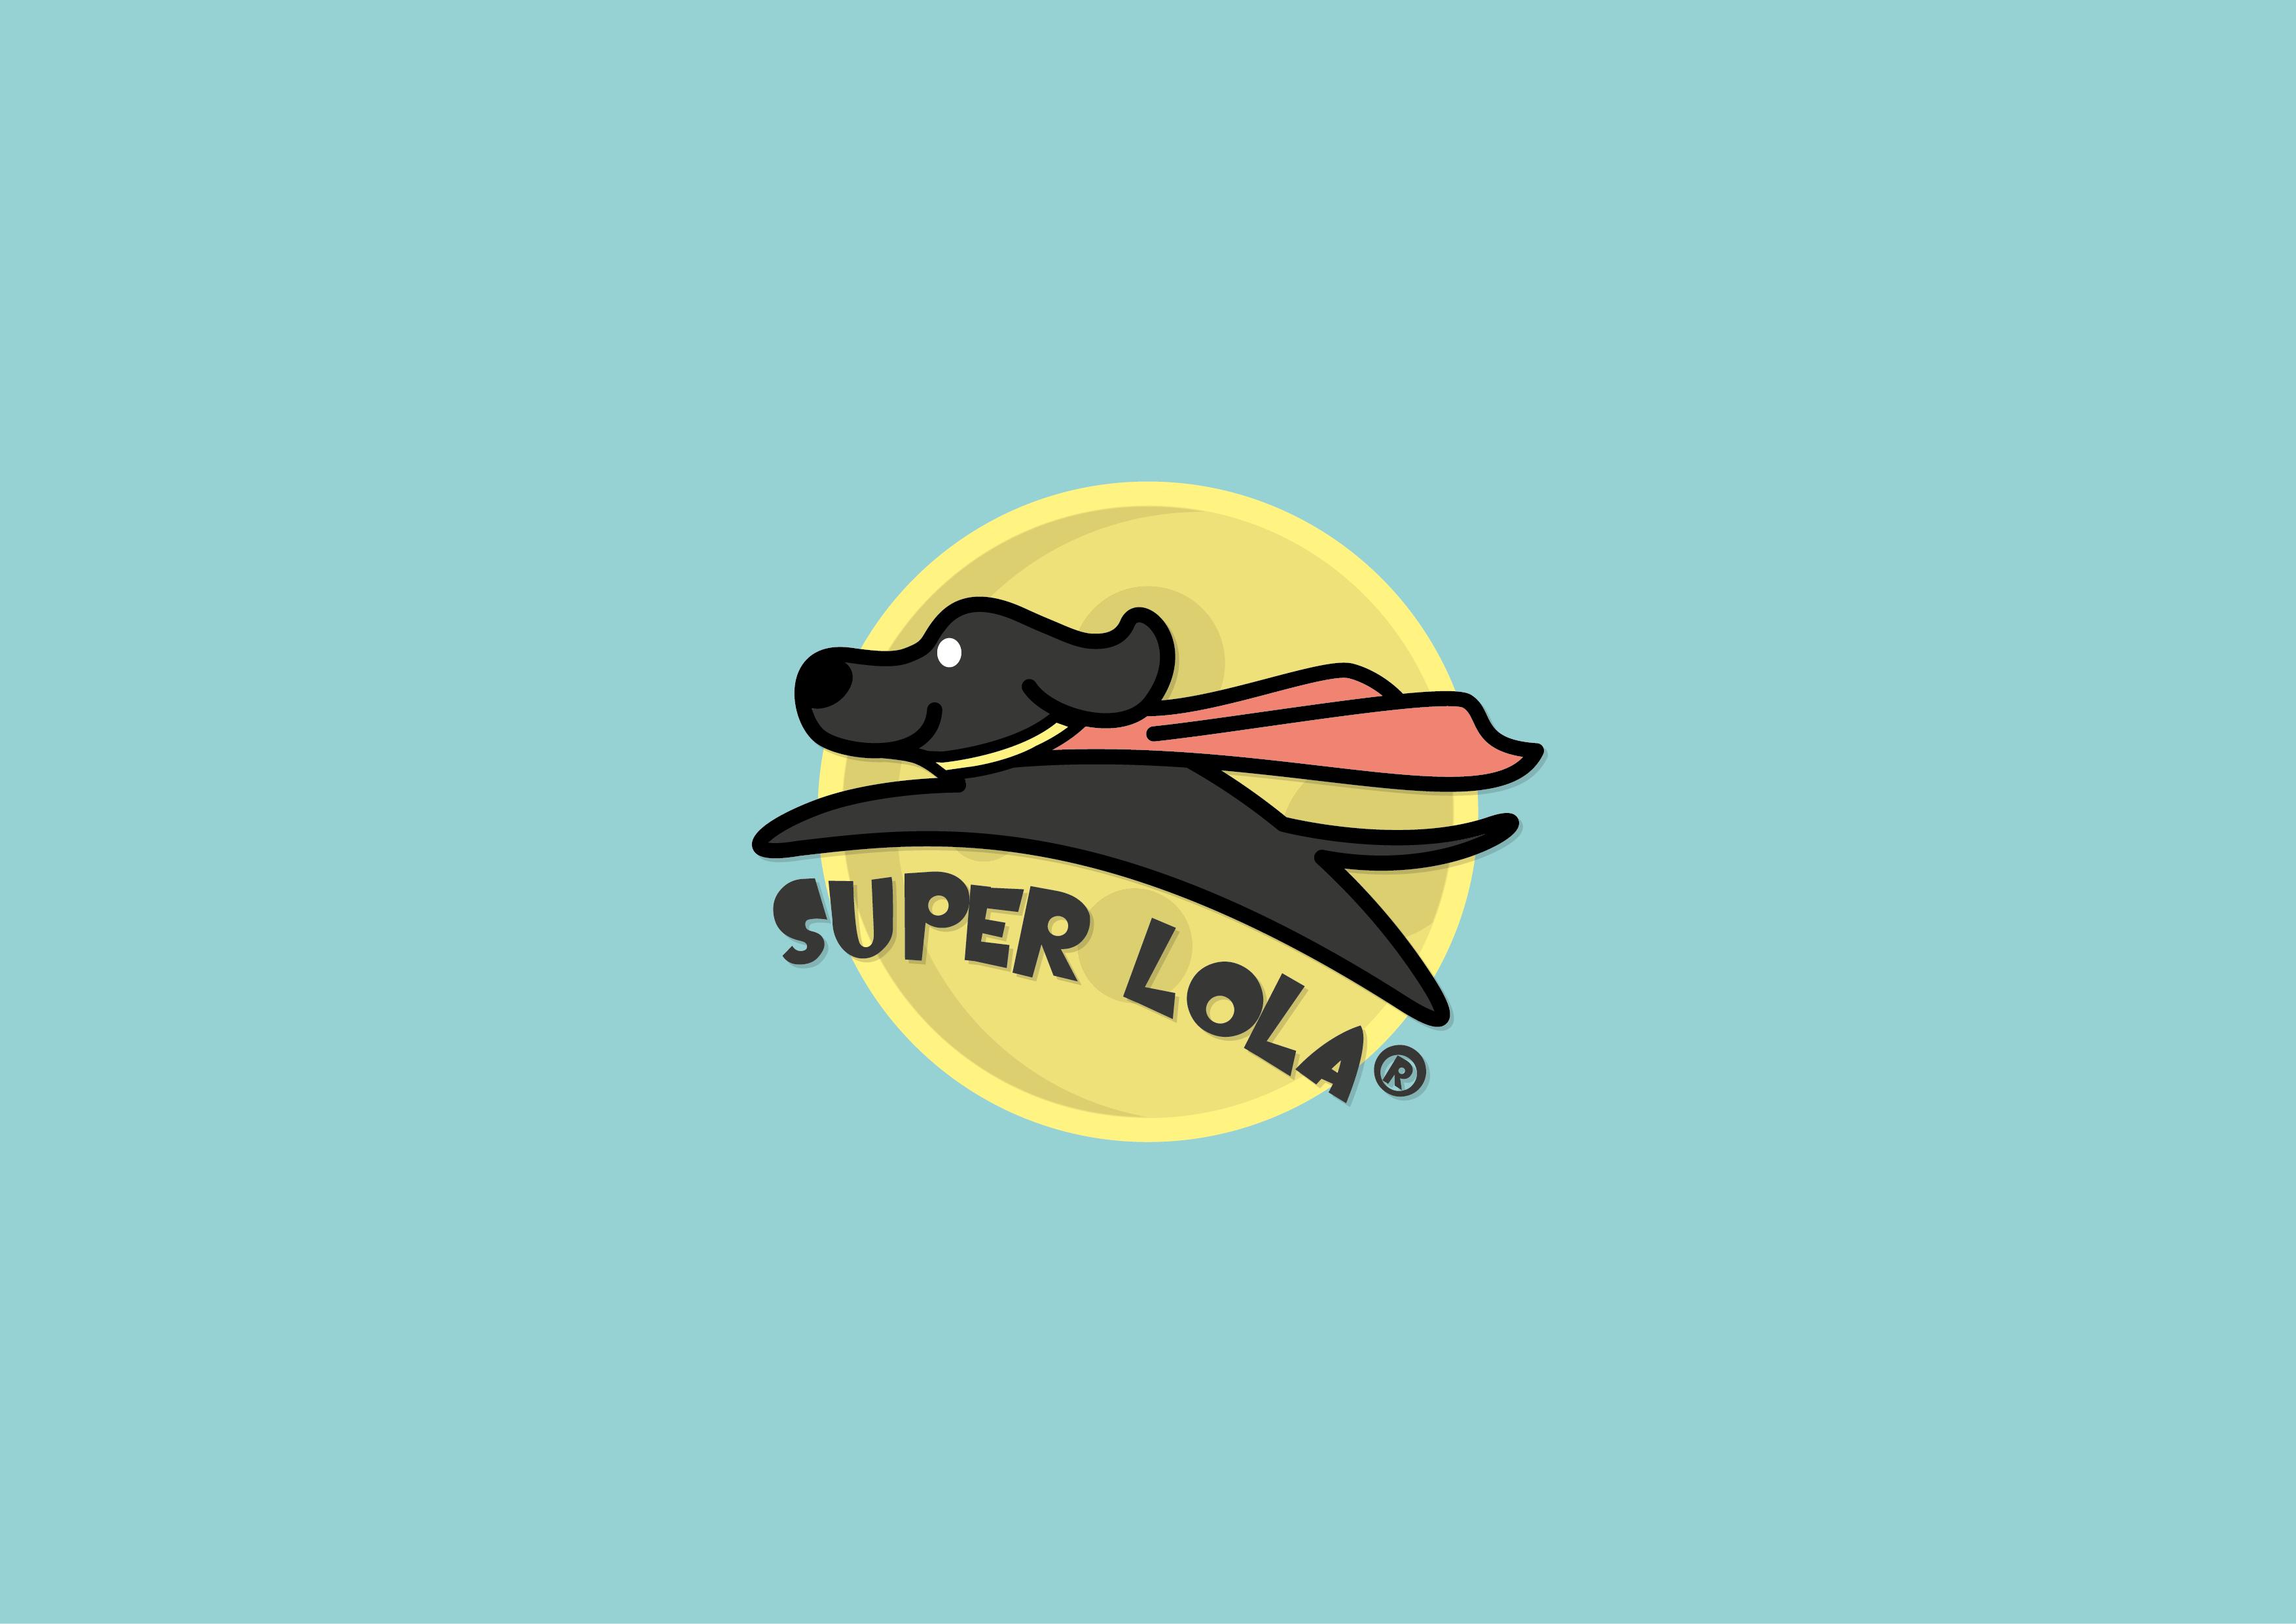 Playful Modern Pet Shop Logo Design For Super Lola By Ryan Orlowski Design 22547056